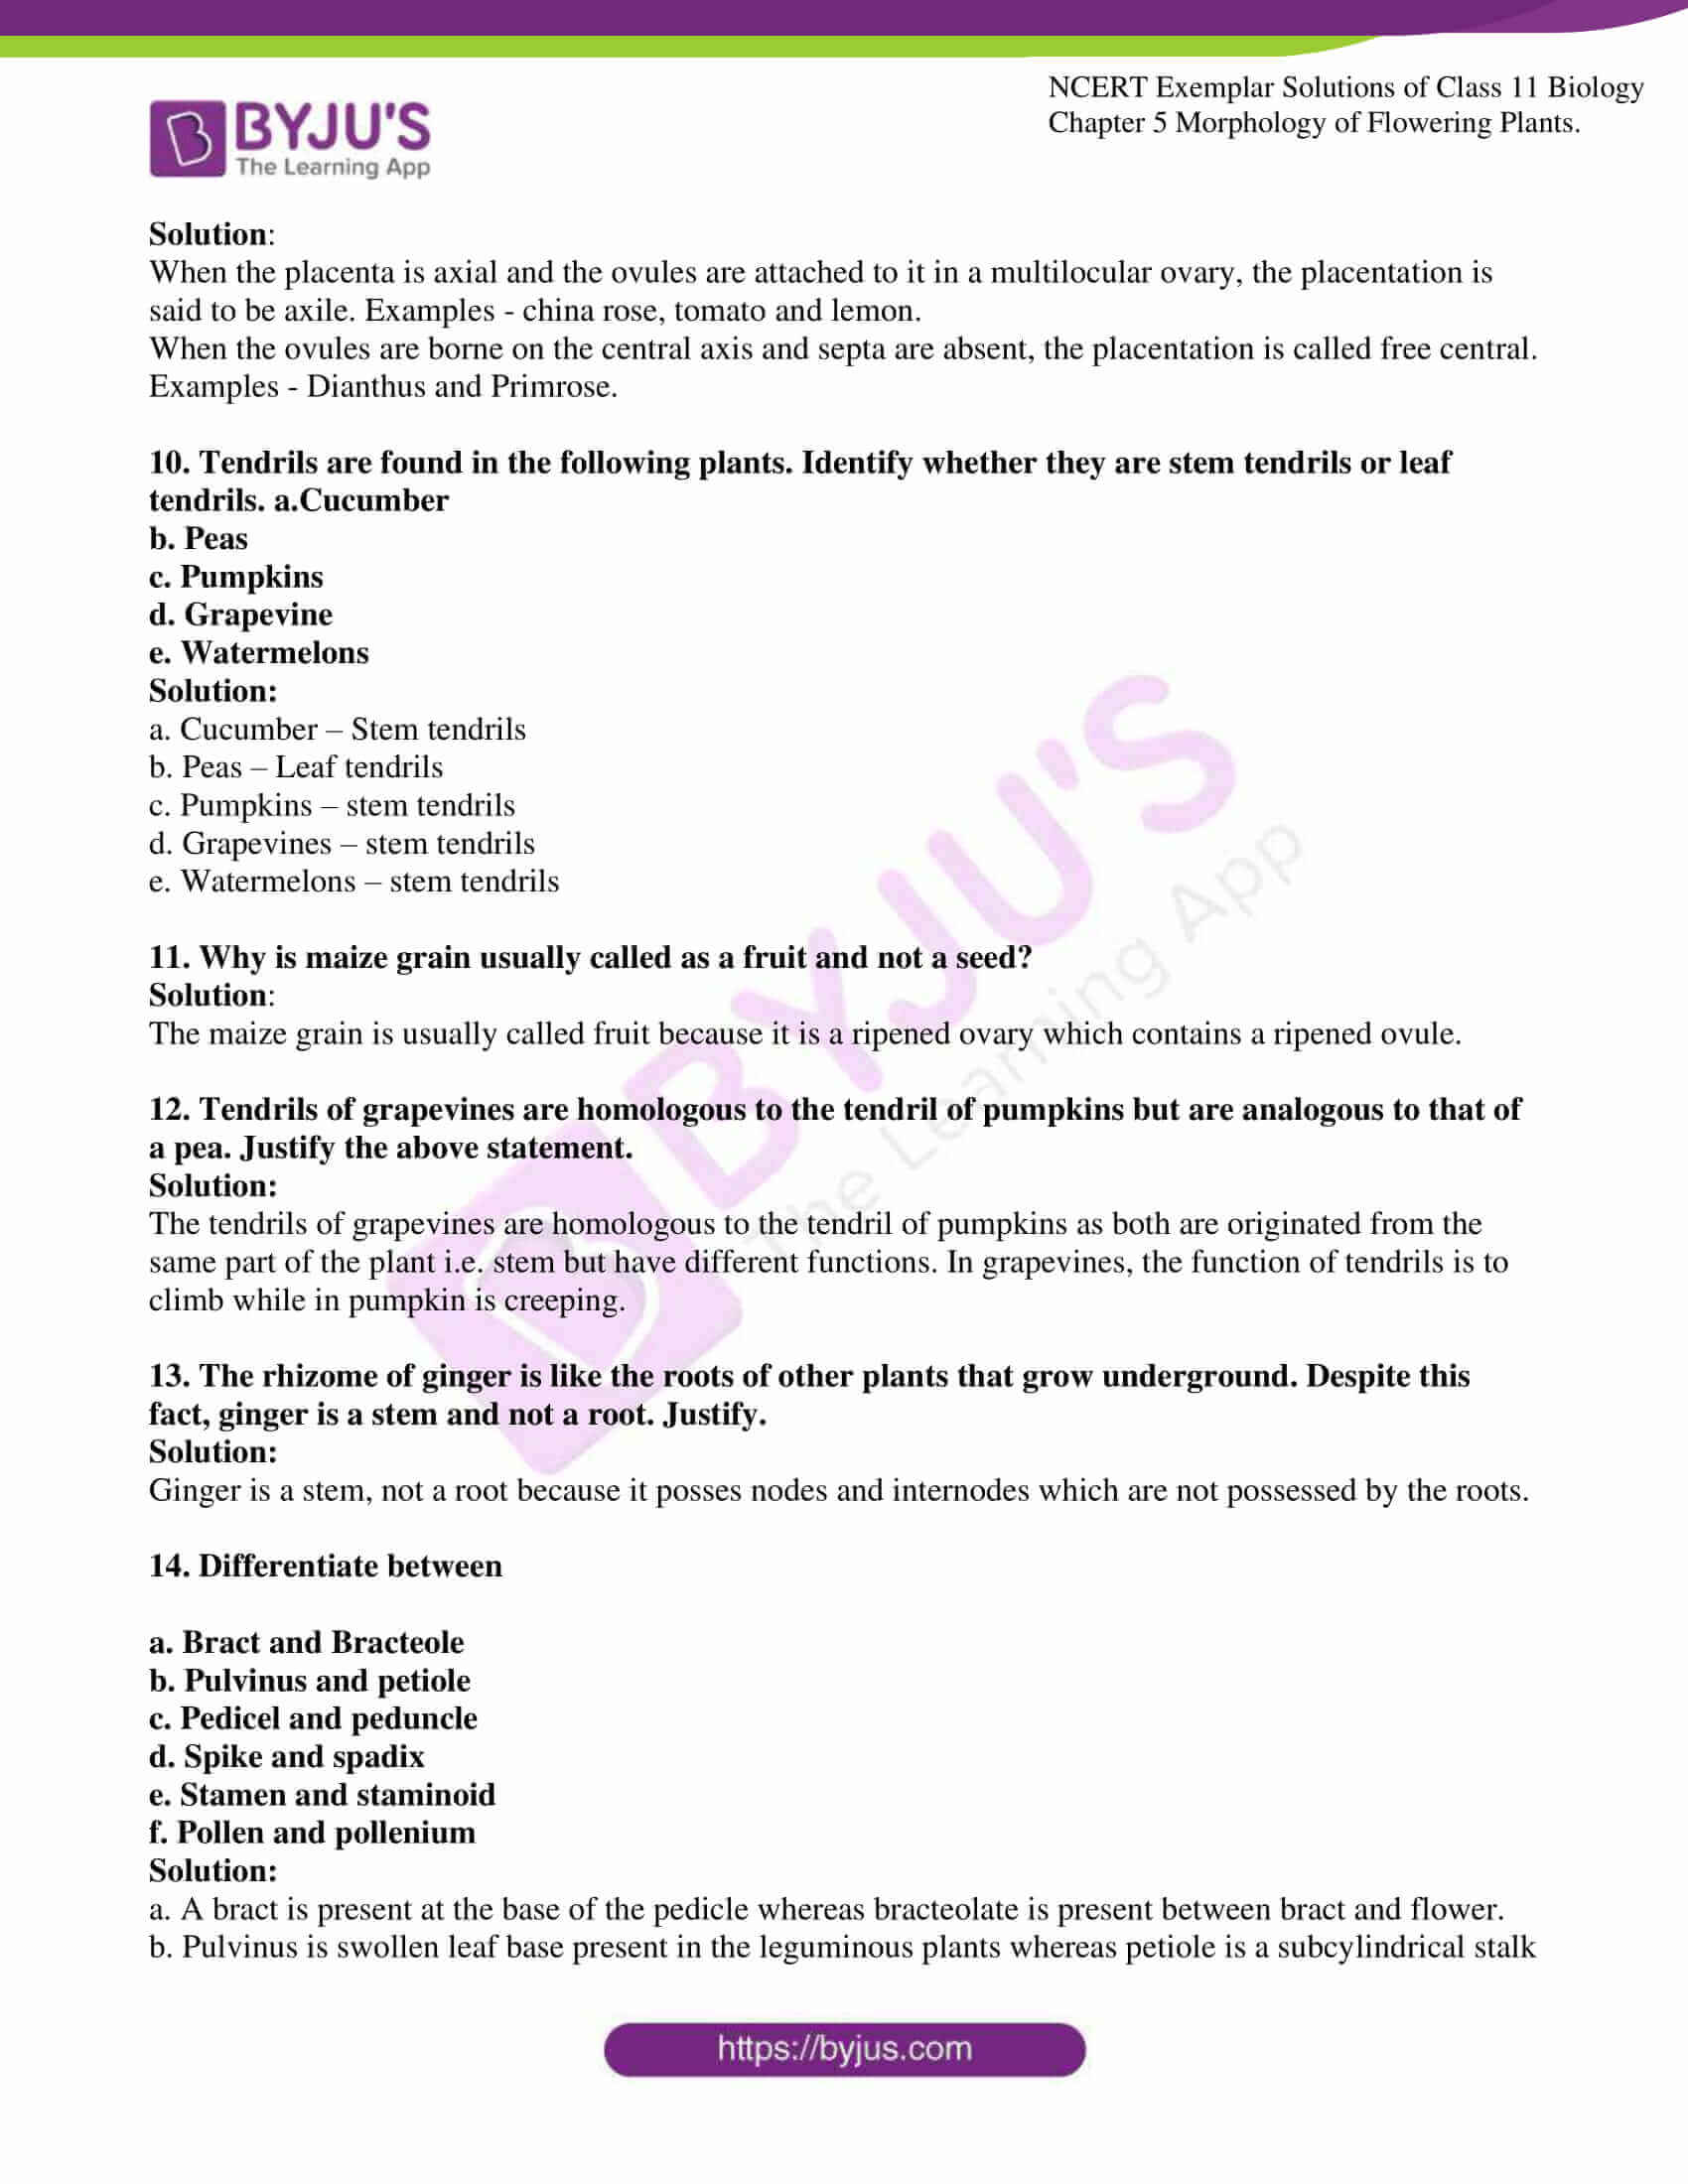 ncert exemplar solutions for class 11 bio chapter 5 08